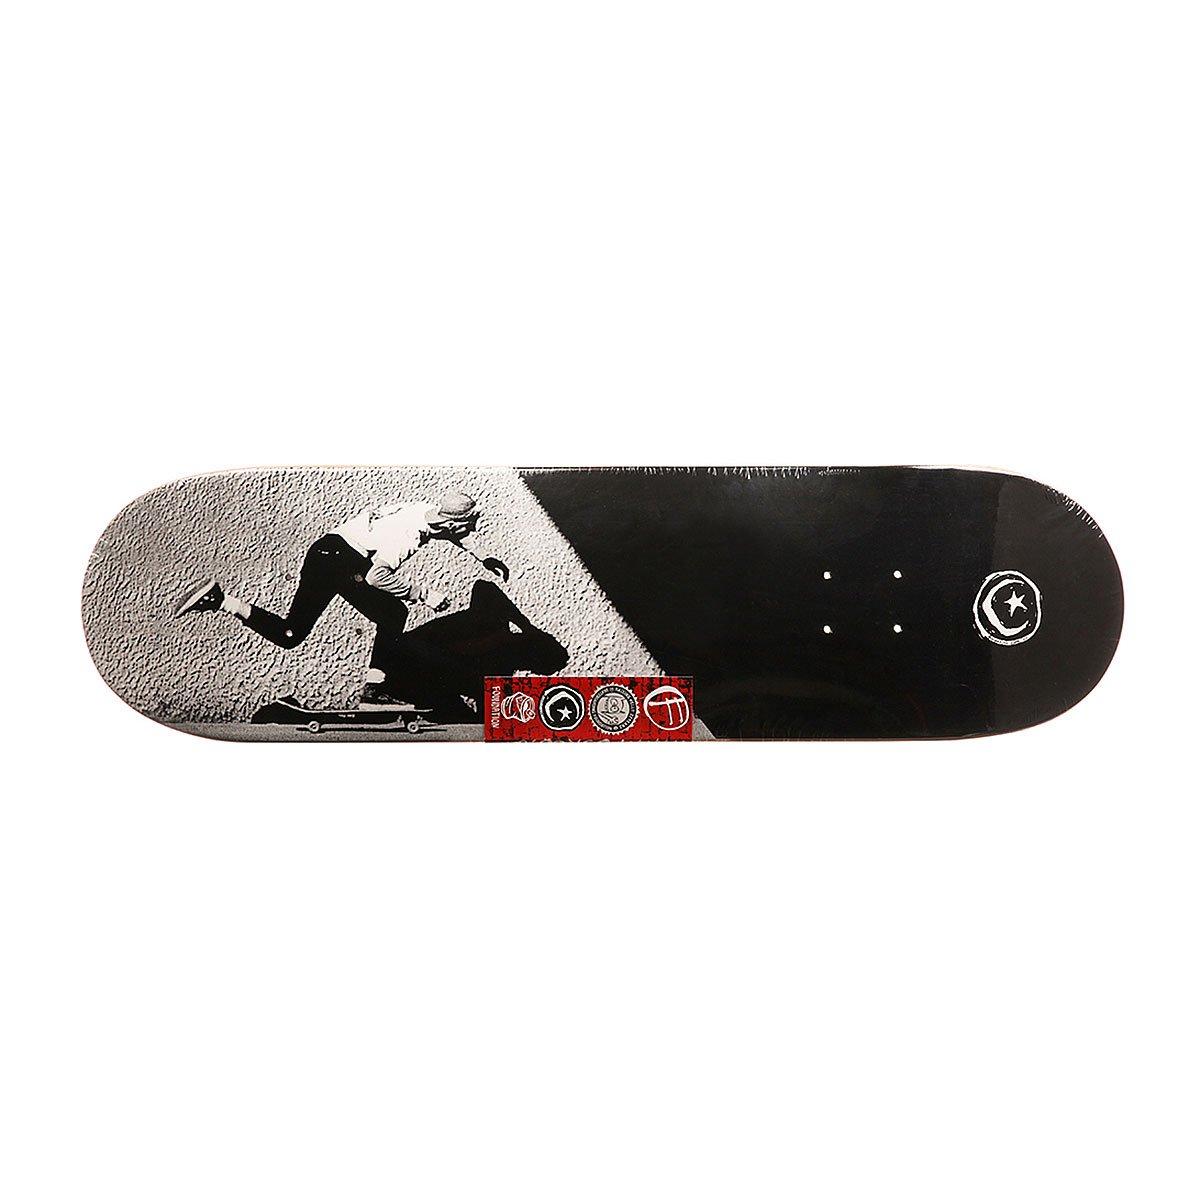 Дека для скейтборда Foundation Jgb Push Black/Grey 31 75 x 8 25 (21 см)